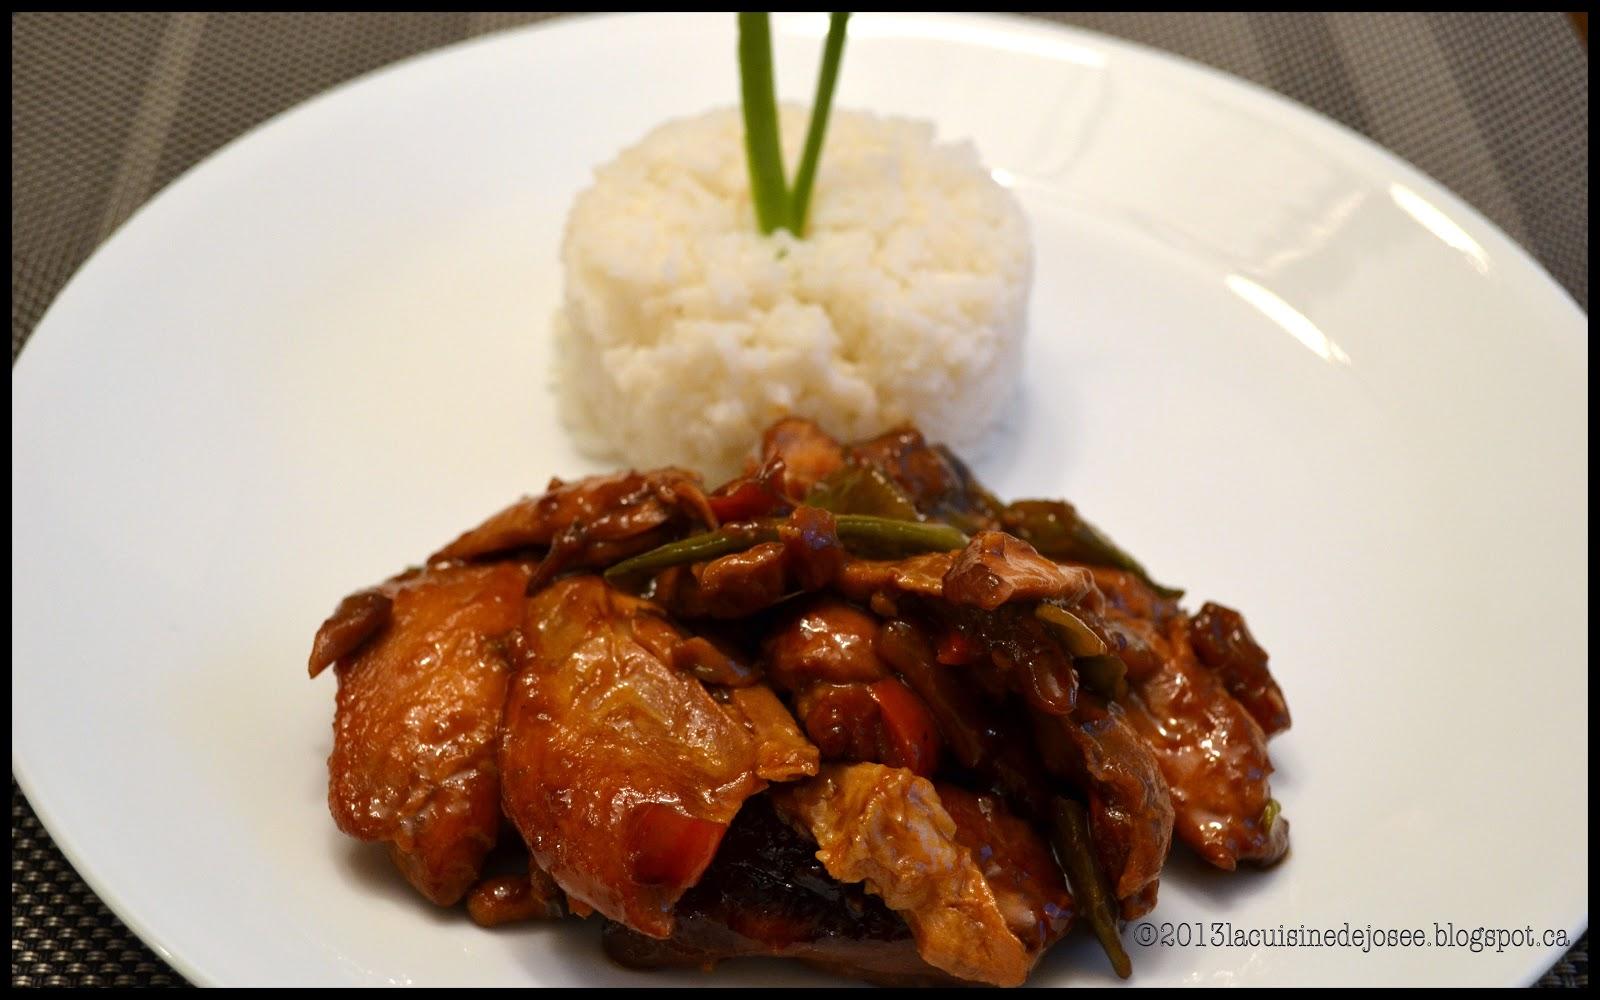 La cuisine de jos e poulet l 39 ananas la mijoteuse - Ricardo cuisine mijoteuse ...